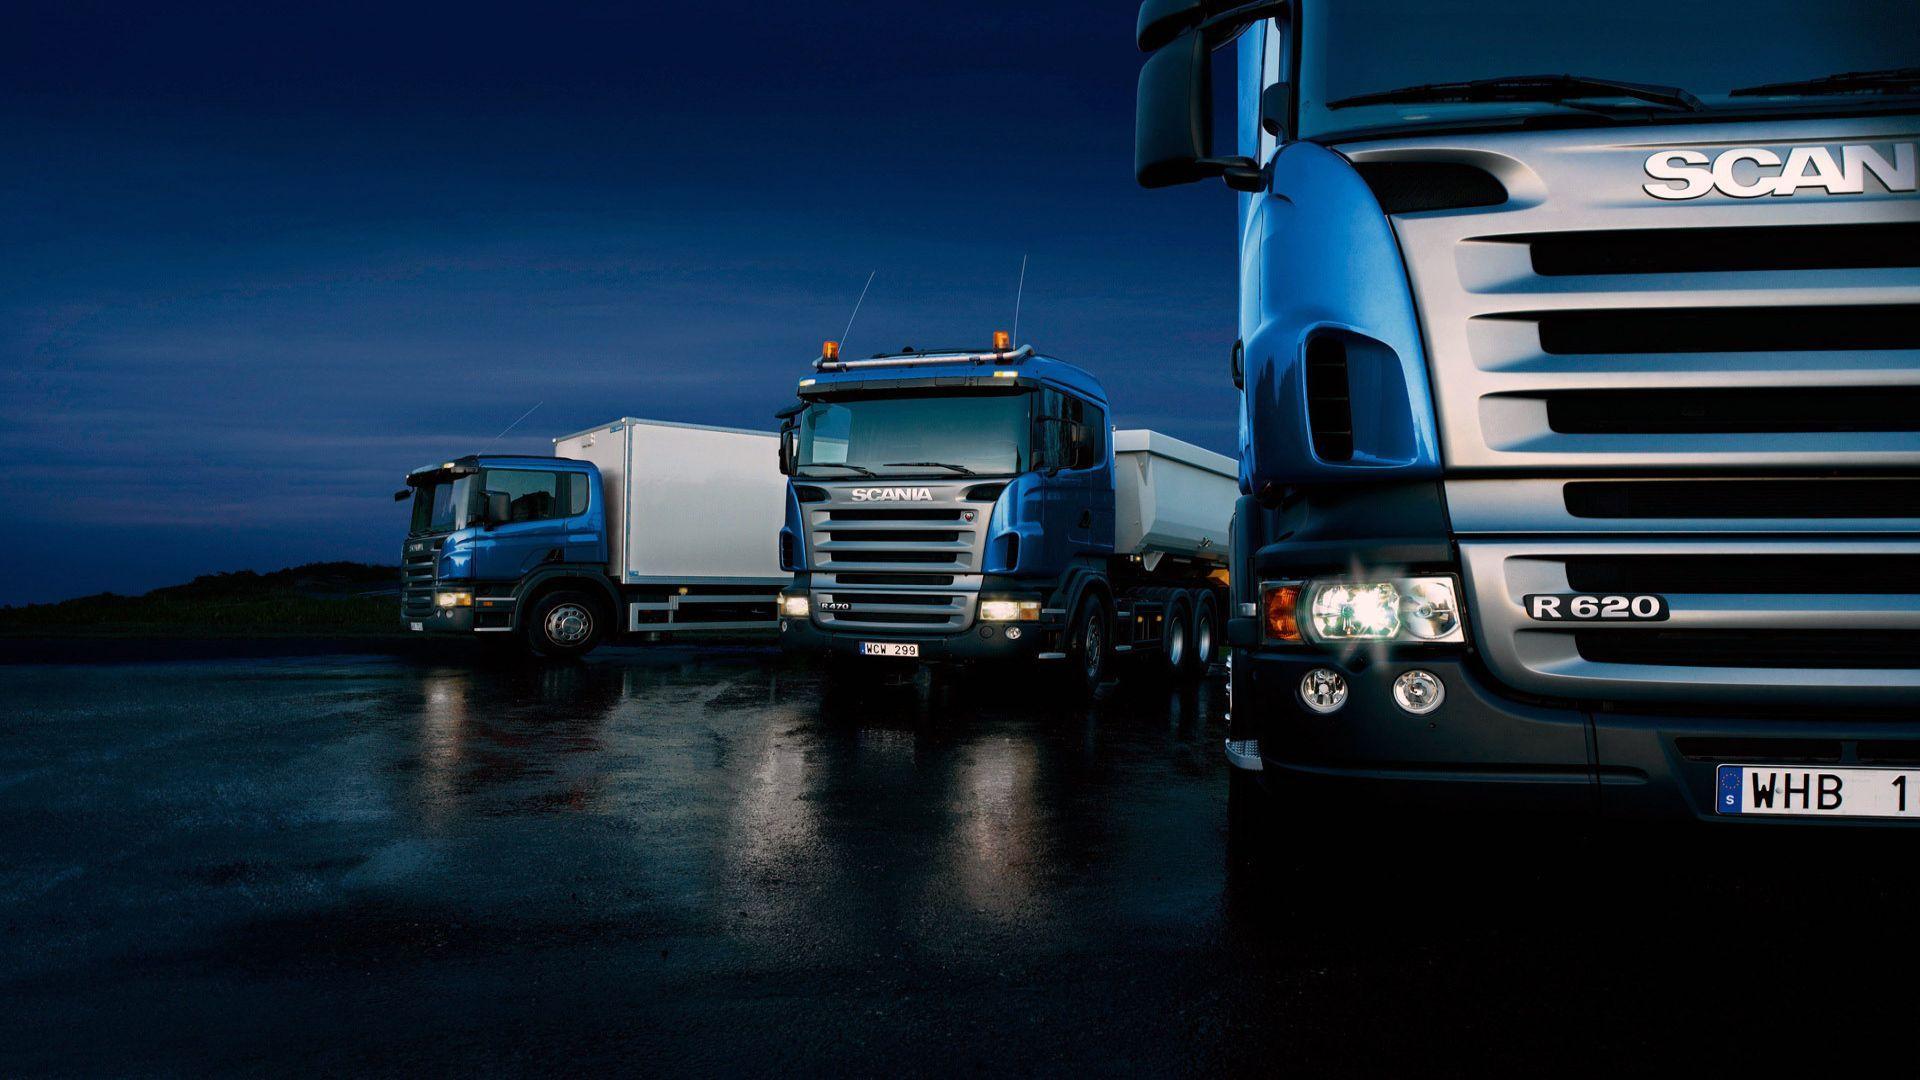 Scania Trucks Picture For Desktop Wallpaper